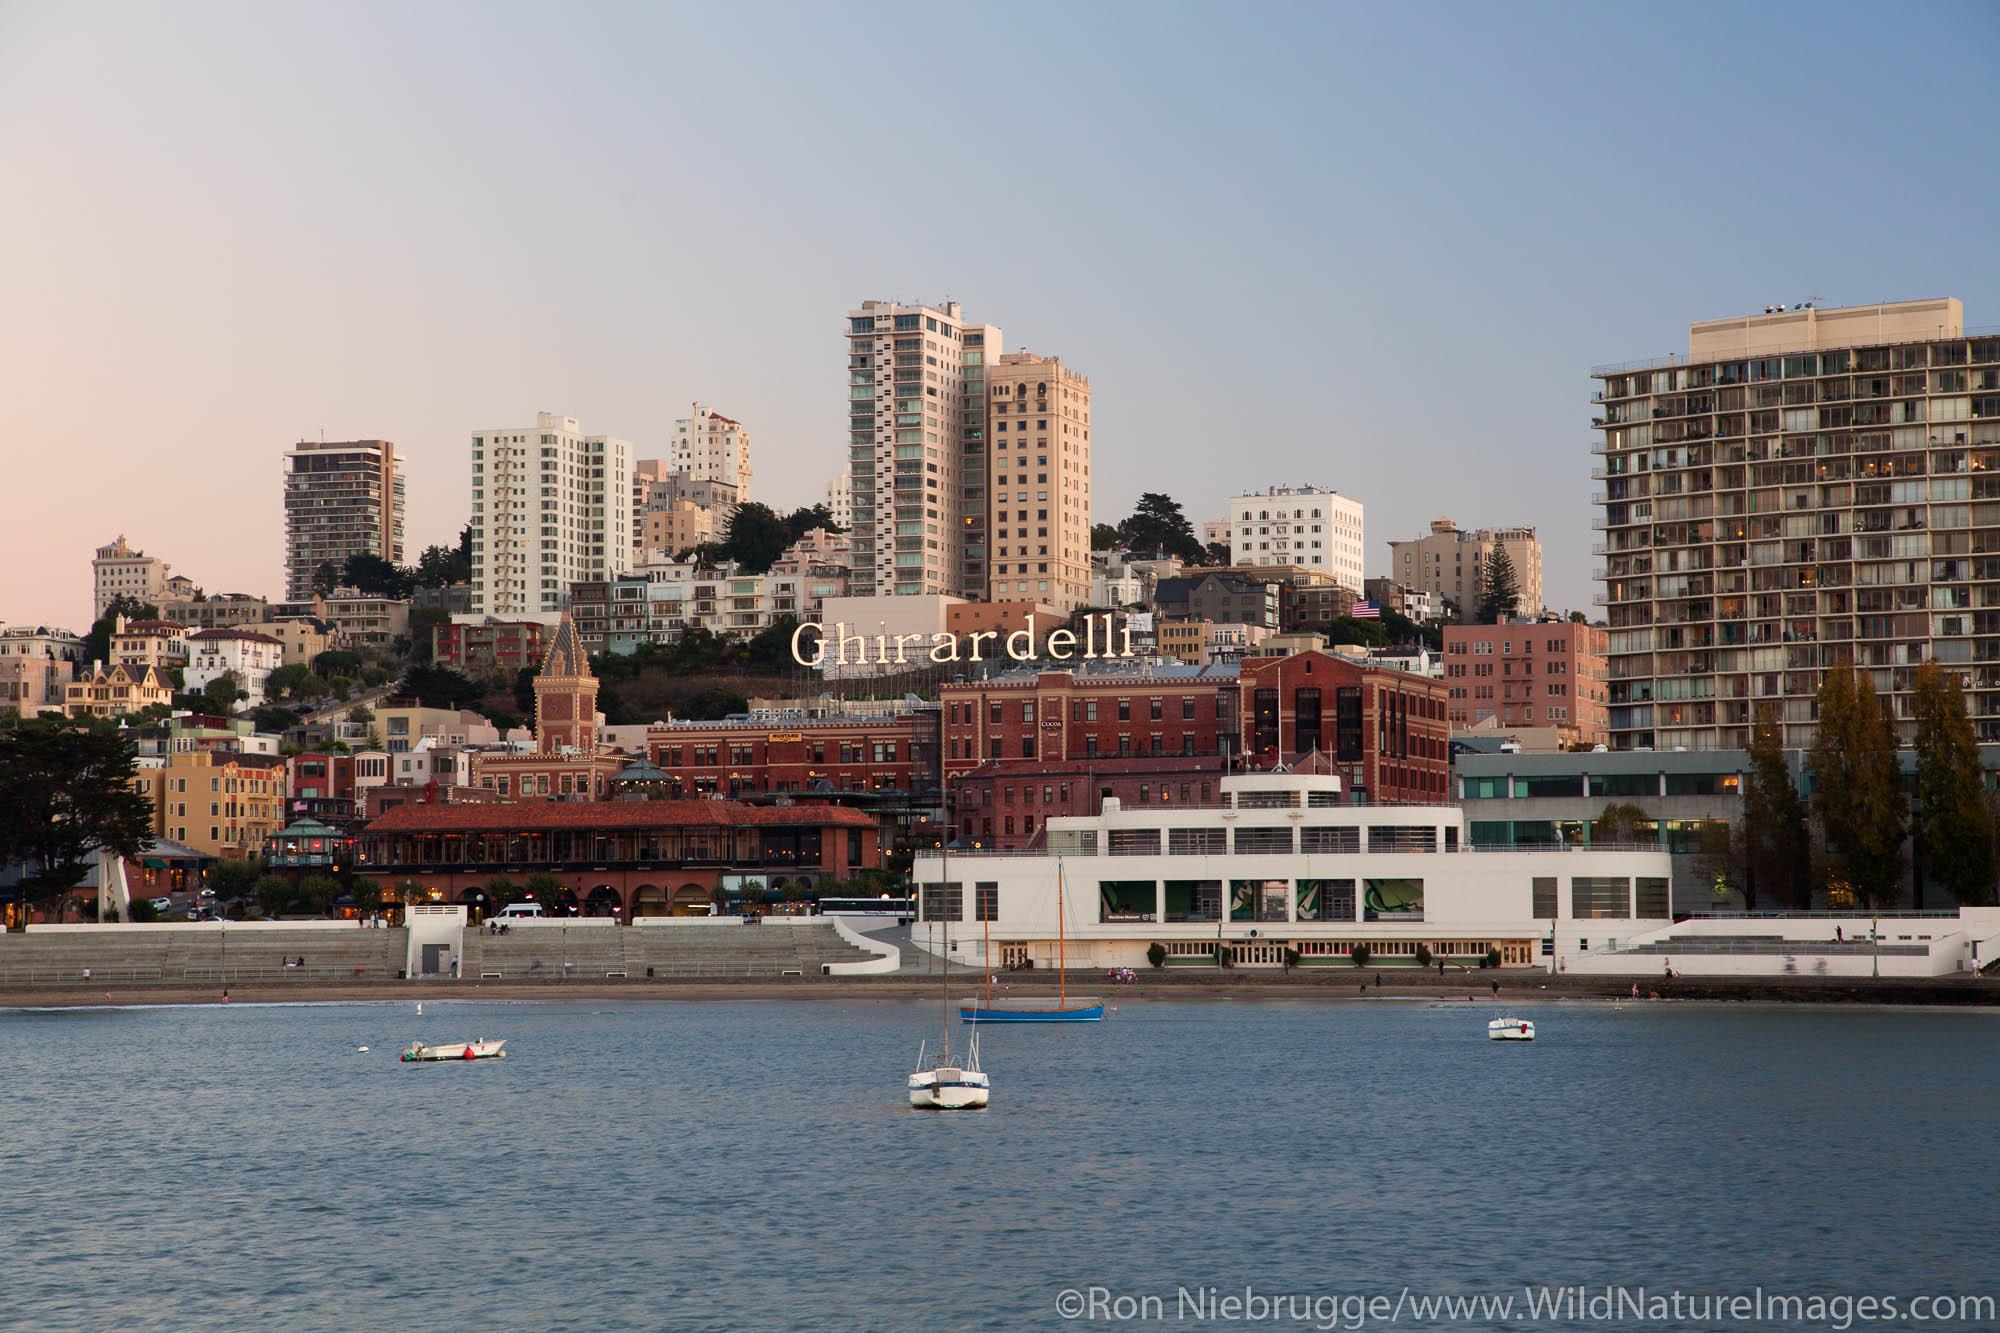 View across Aquatic Park lagoon to Ghirardelli Square, San Francisco, CA